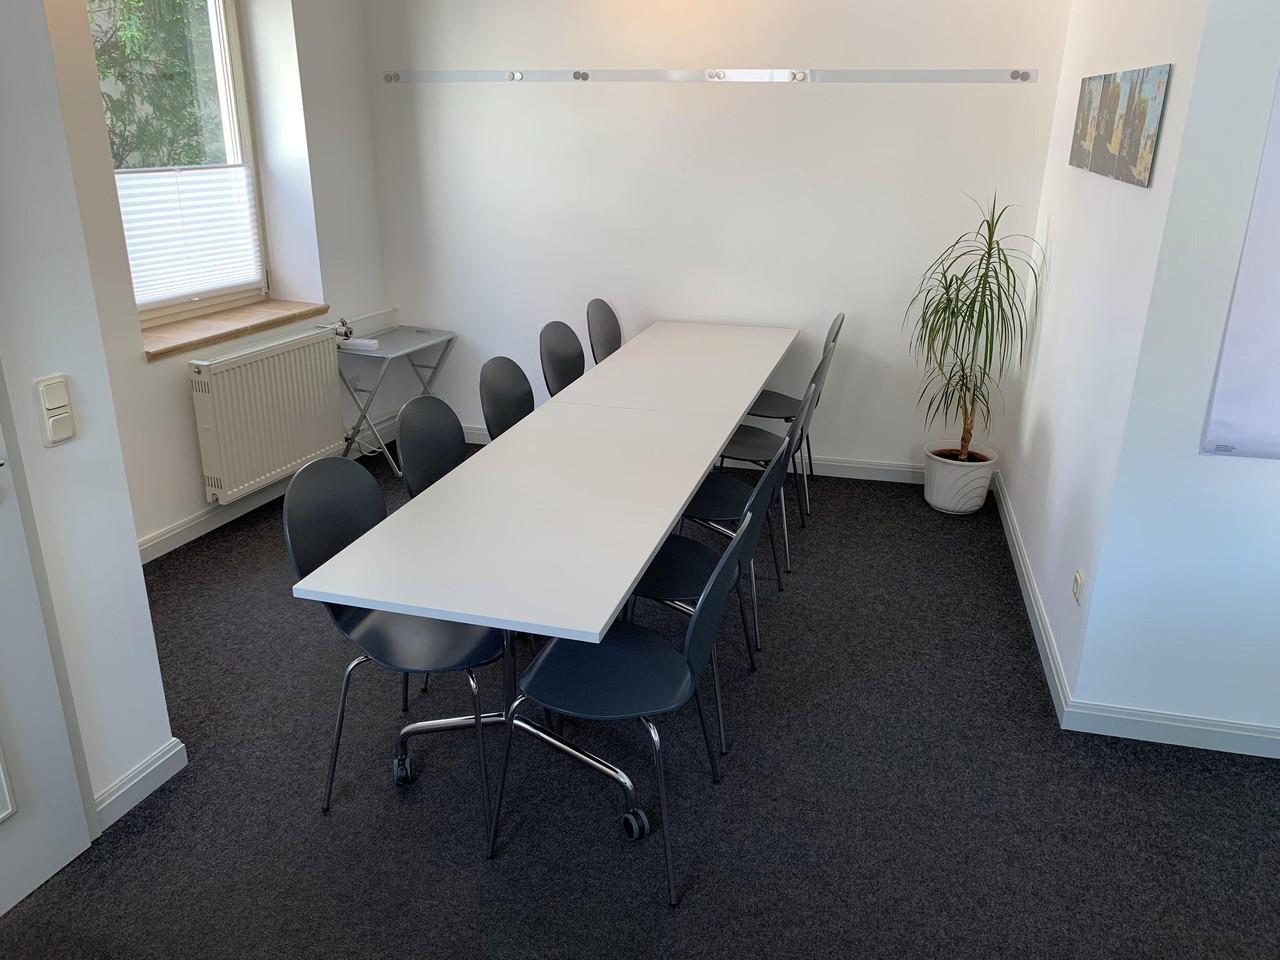 Frankfurt Seminarräume Meeting room FachWerk image 4